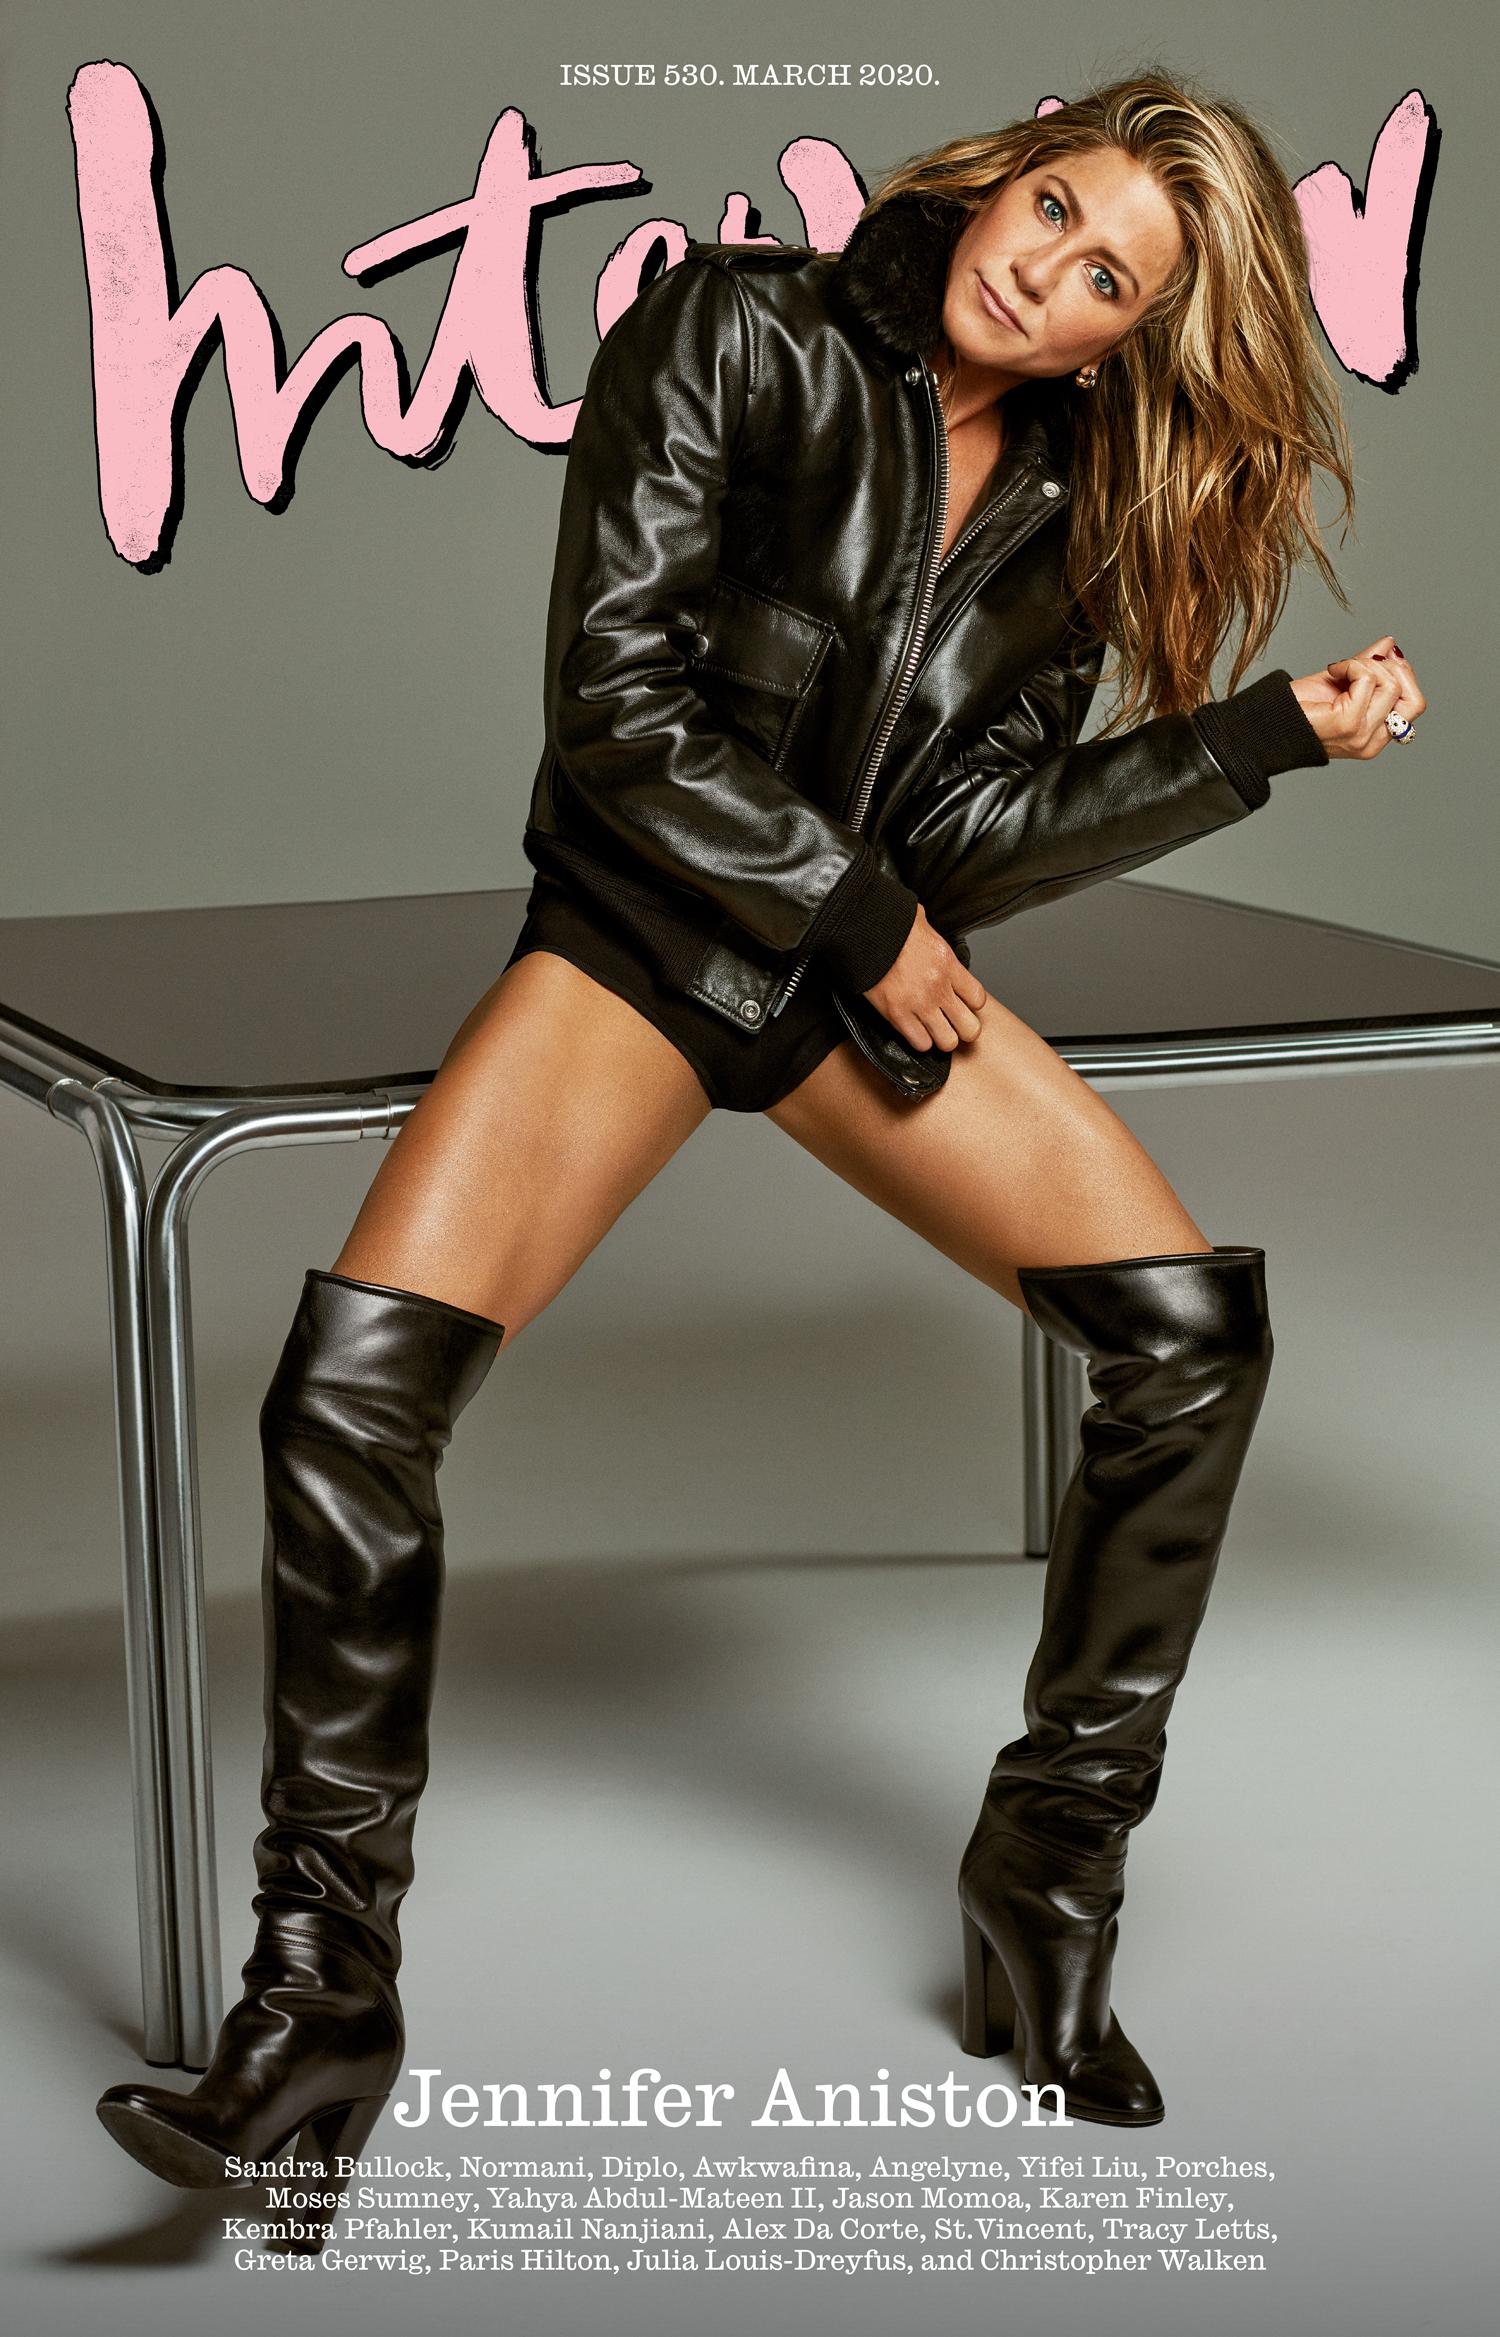 Jennifer Aniston khoe vóc dáng săn chắc, gợi cảm ở tuổi 51